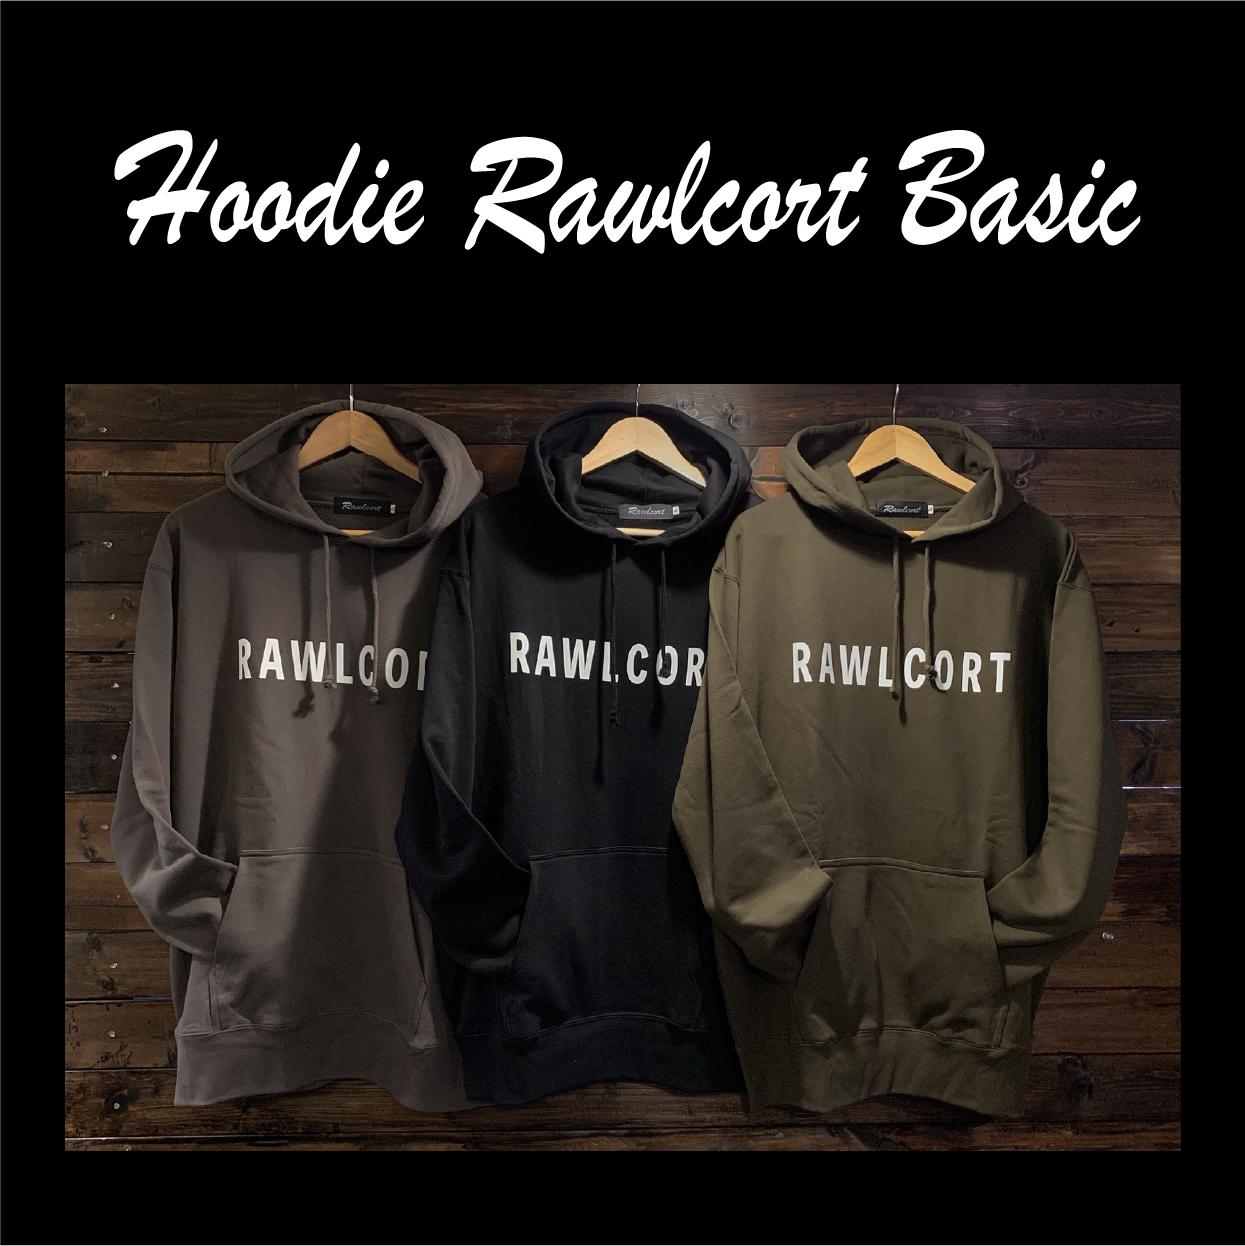 Hoodie Rawlcort  Basic